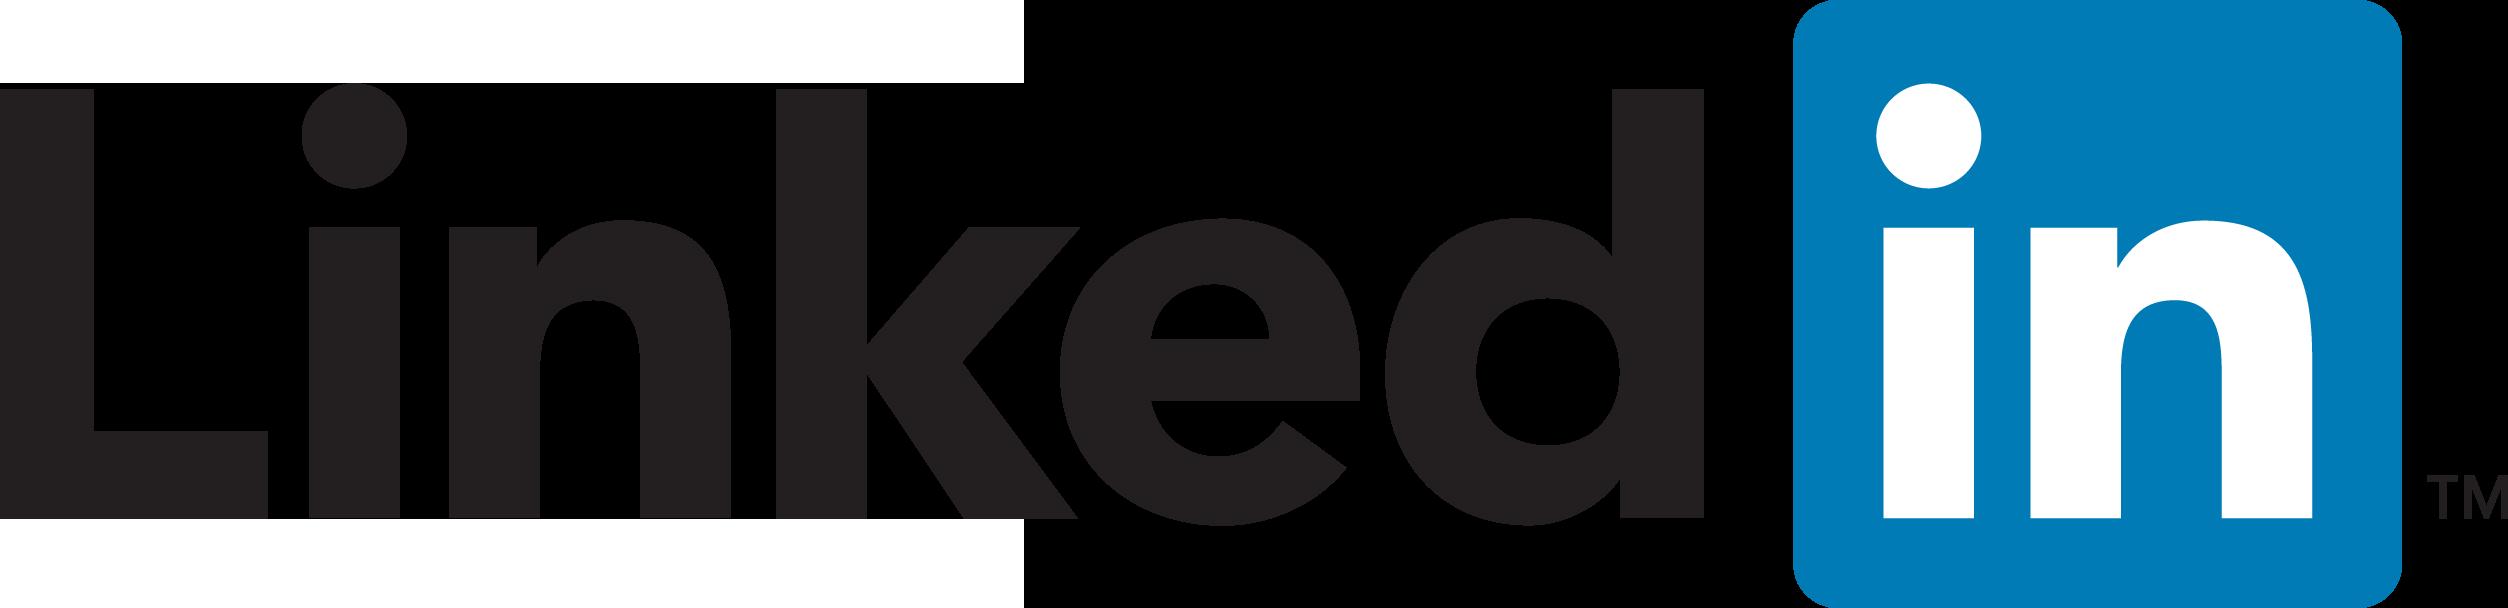 LinkedIn Marktführer